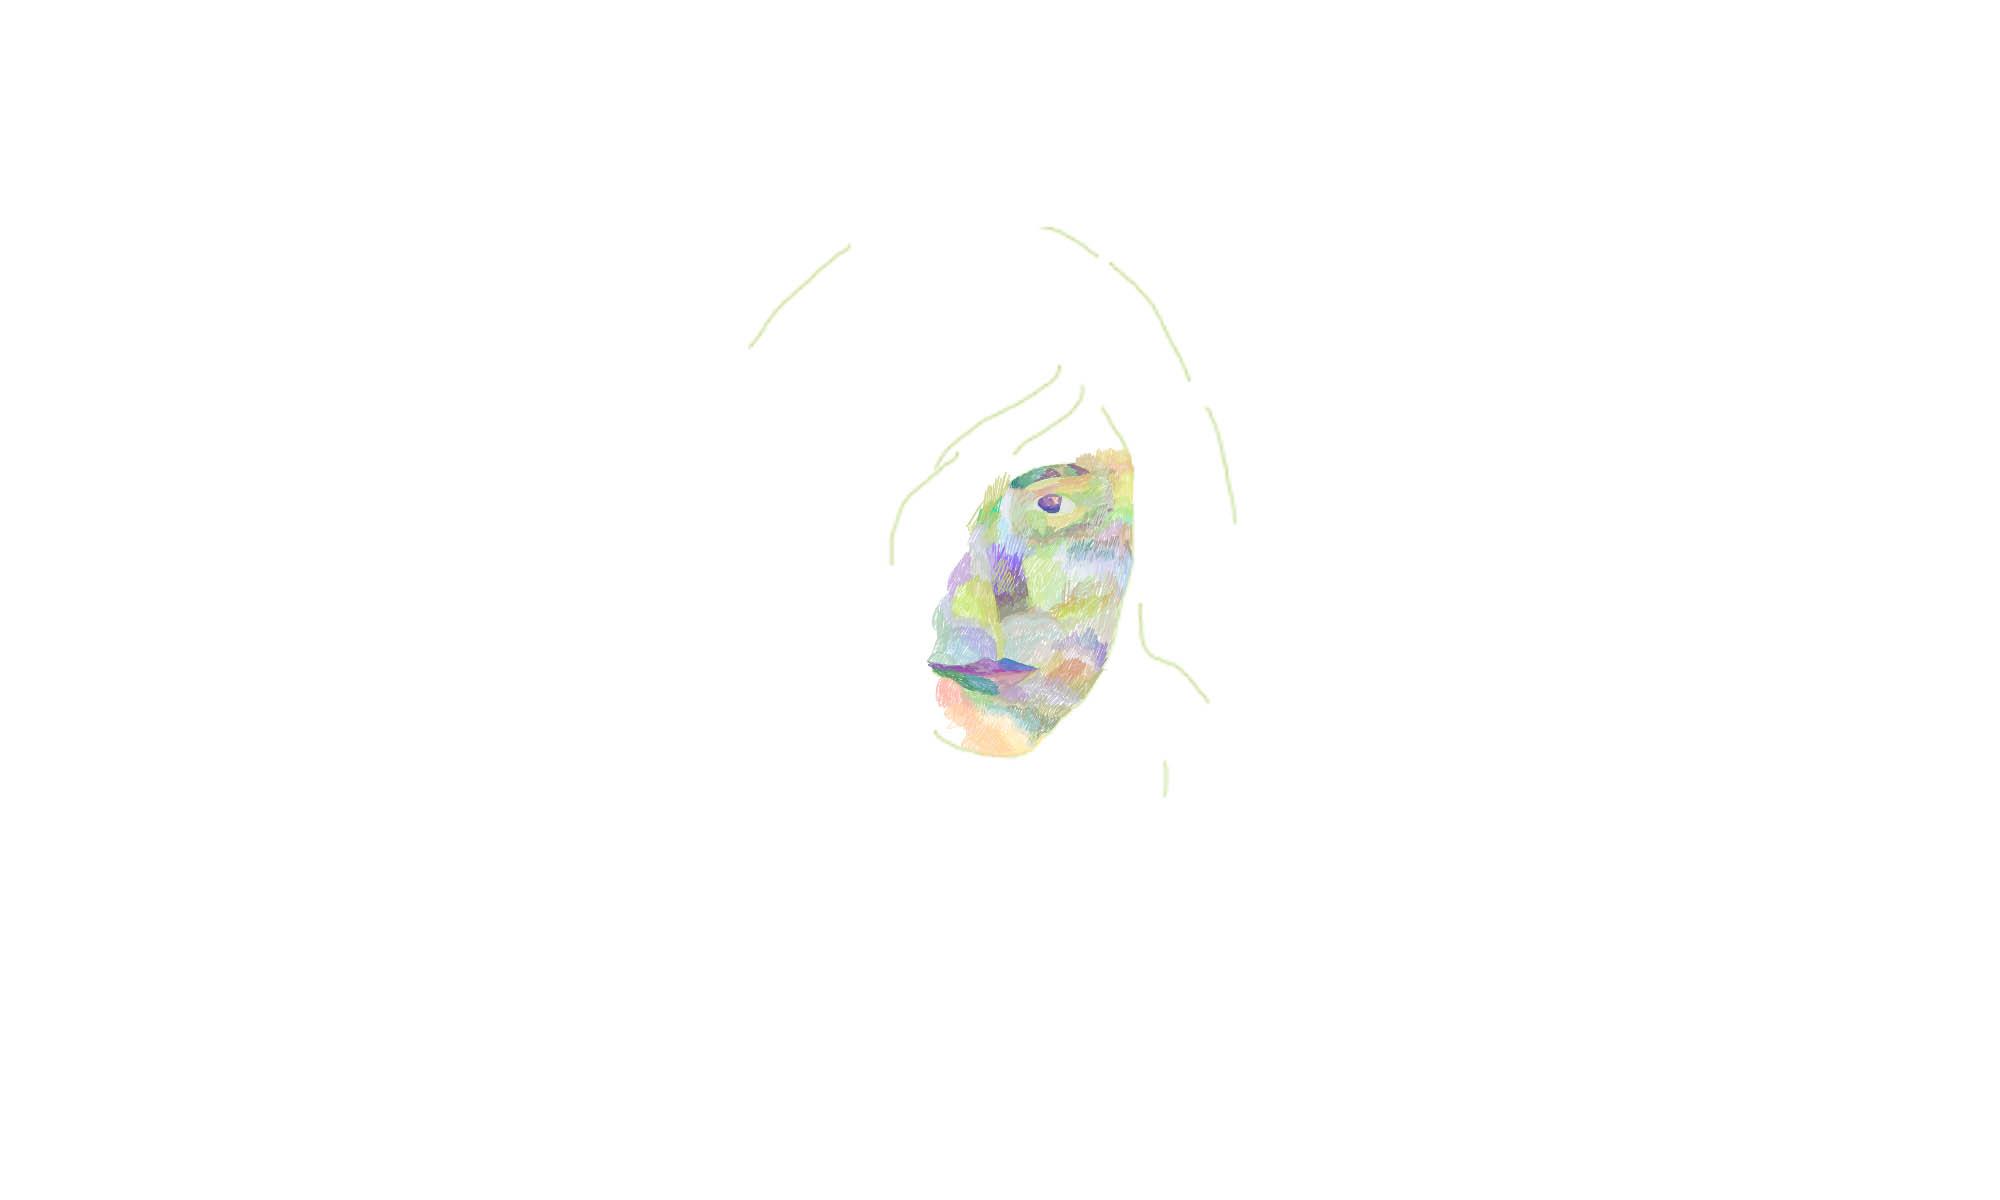 Self Portrait 1   2012  Digital Illustration